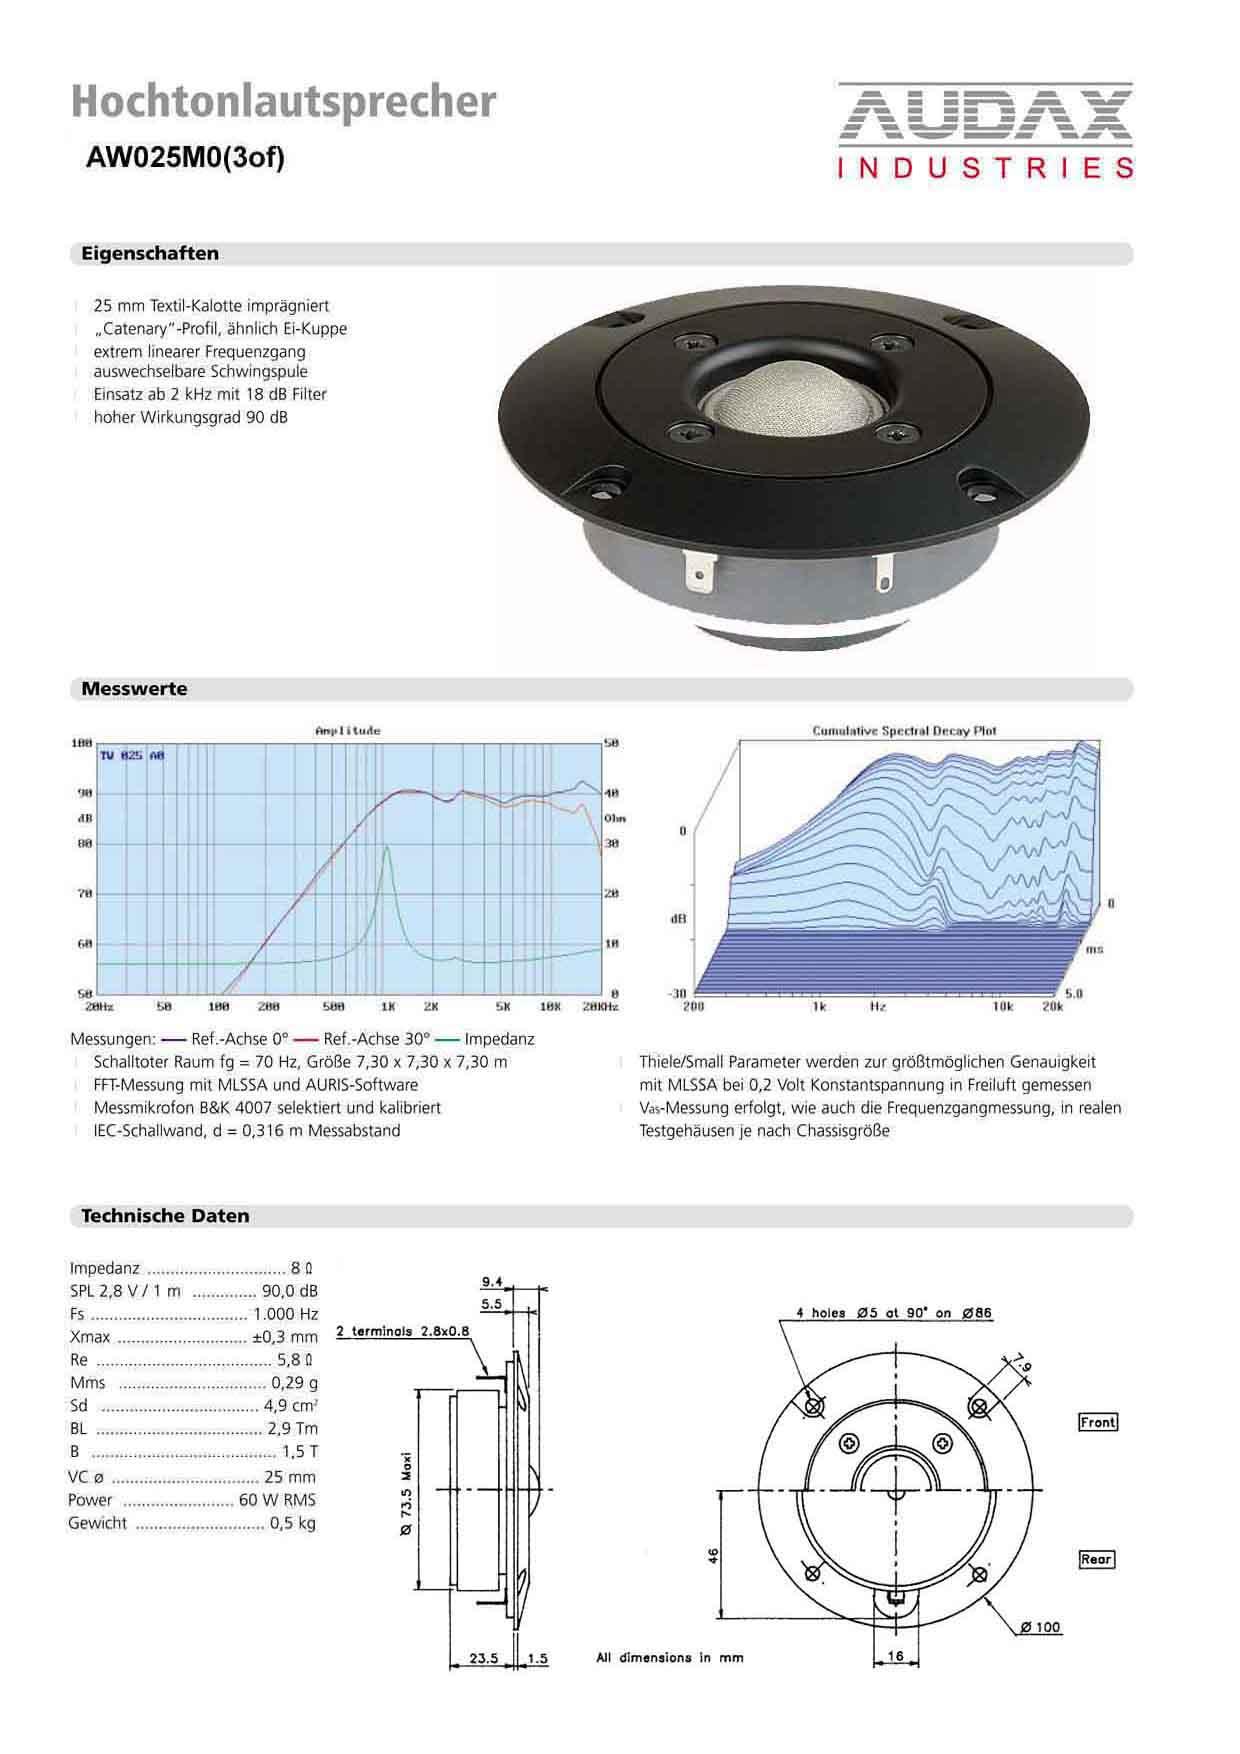 Datenblatt HT-FF_2012